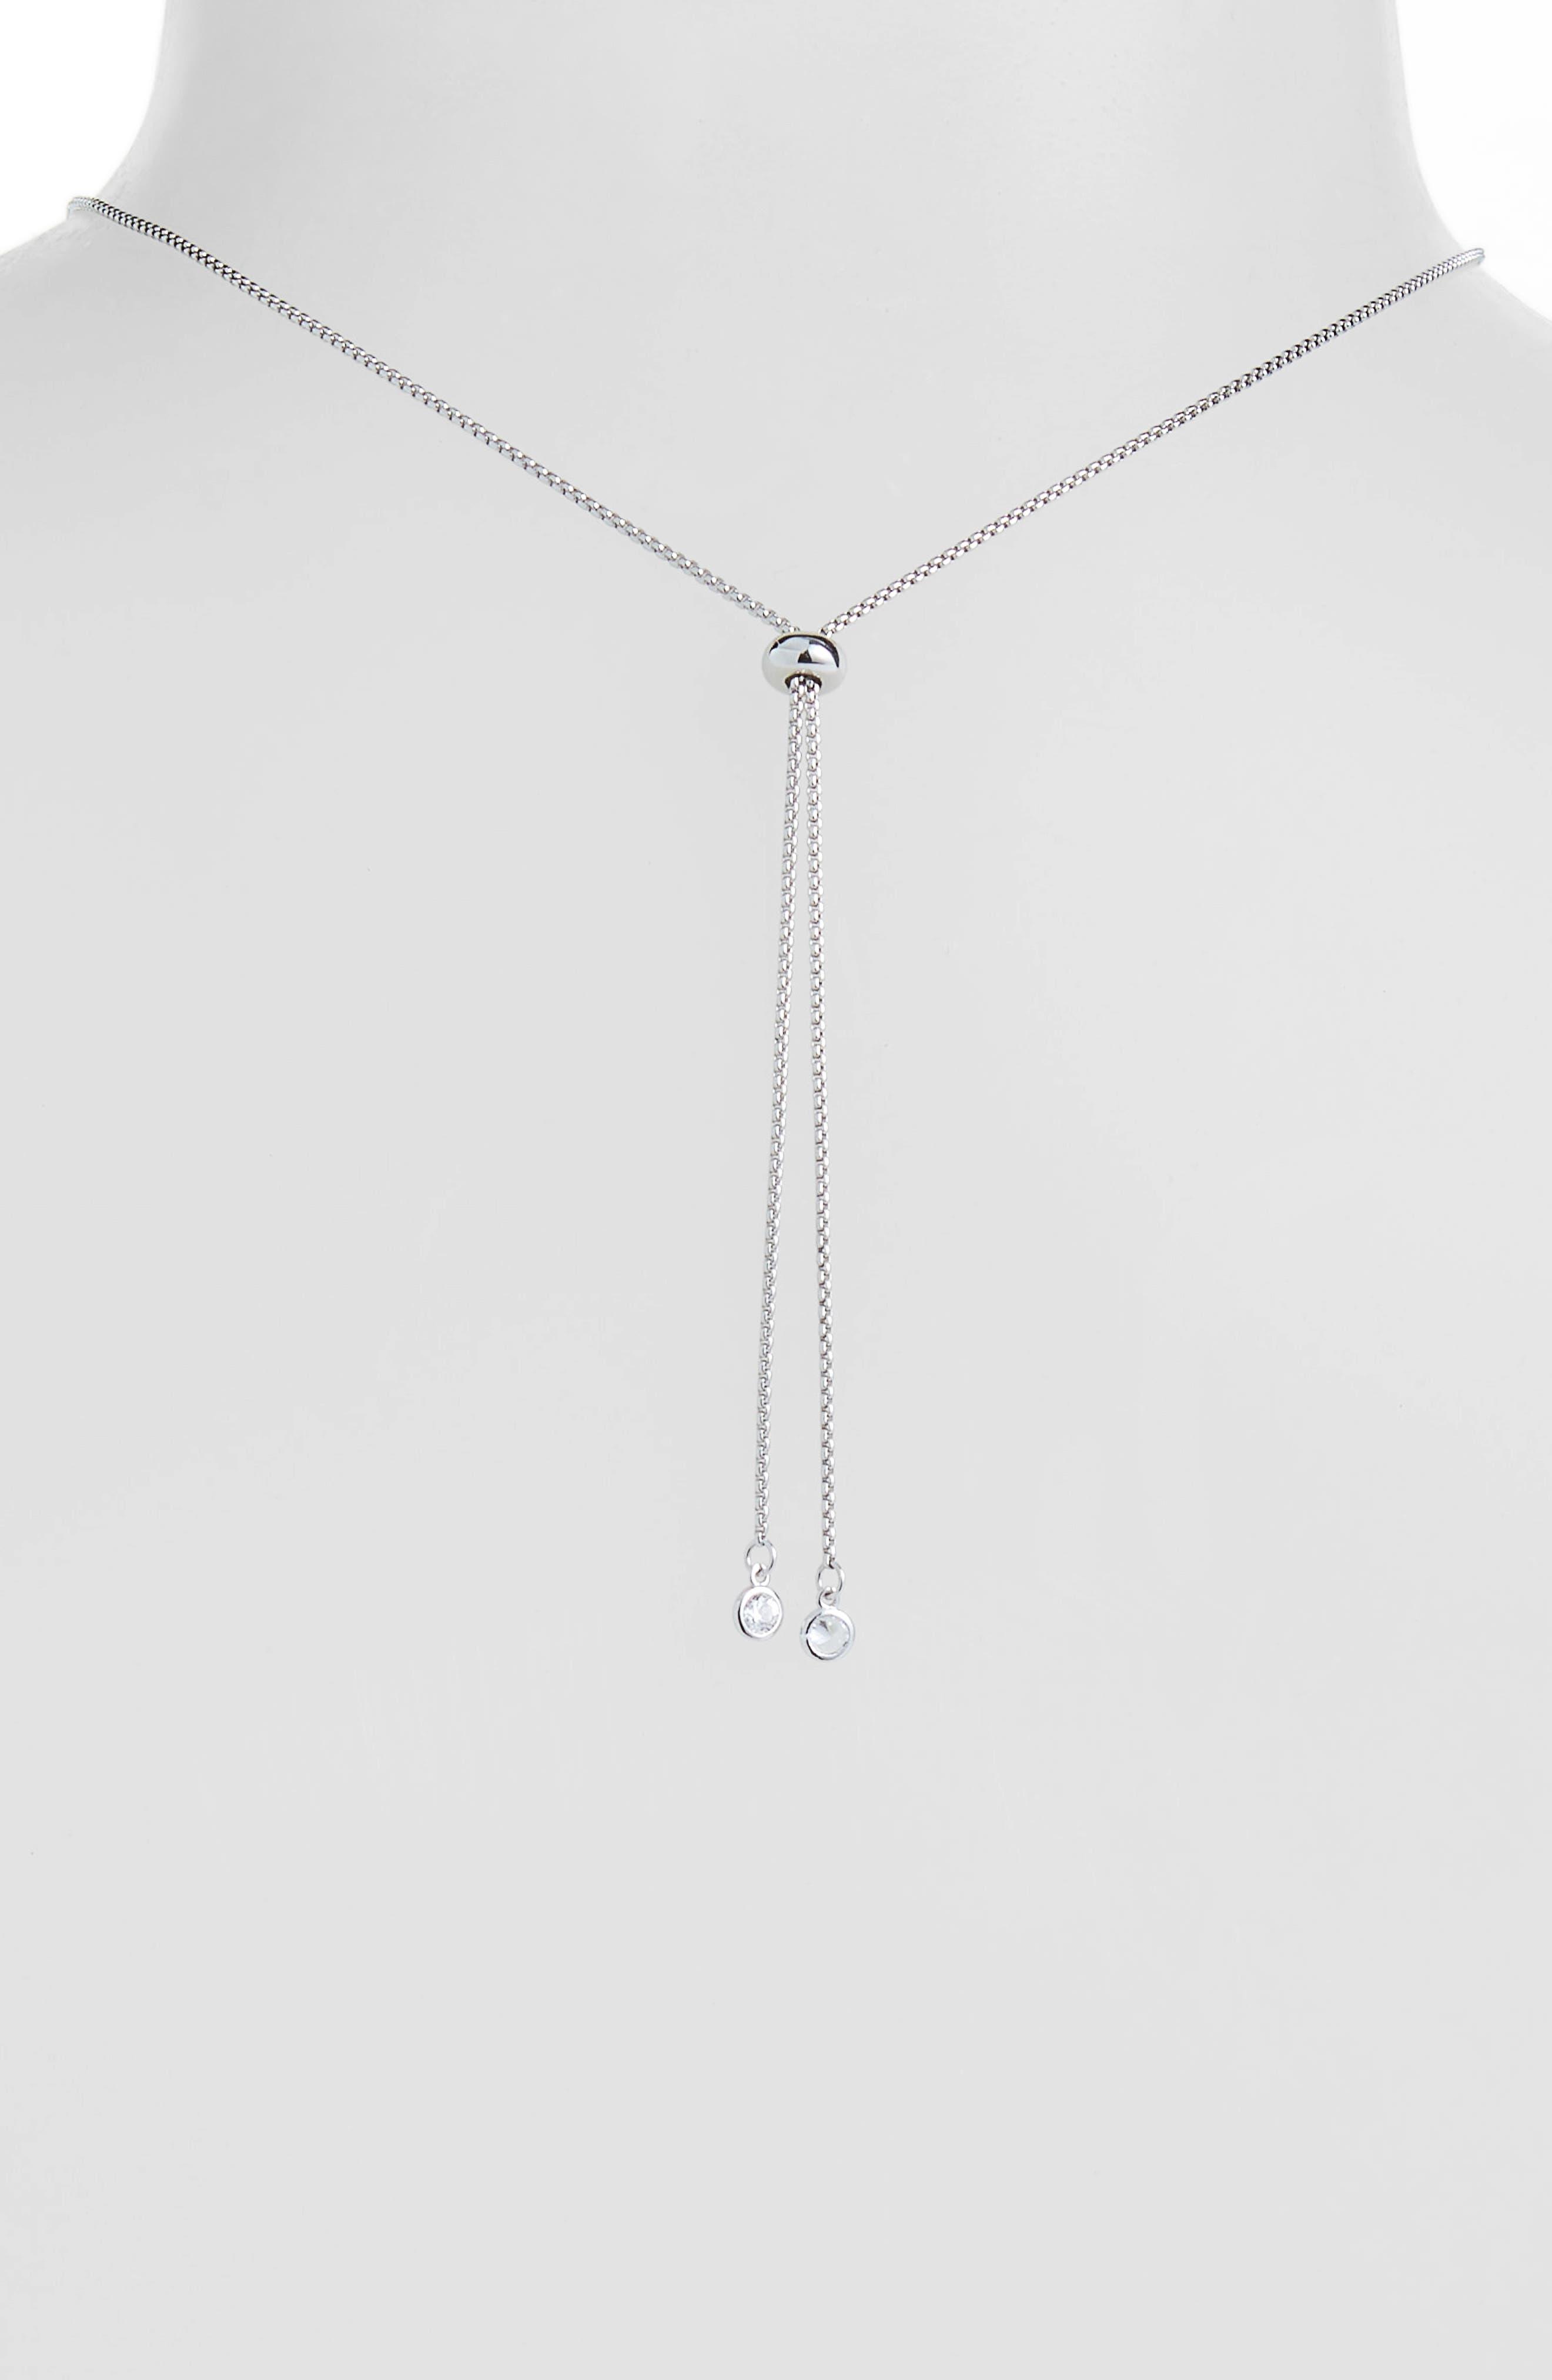 Metal Pavé Ball Adjustable Slide Necklace,                             Alternate thumbnail 3, color,                             CLEAR/ SILVER